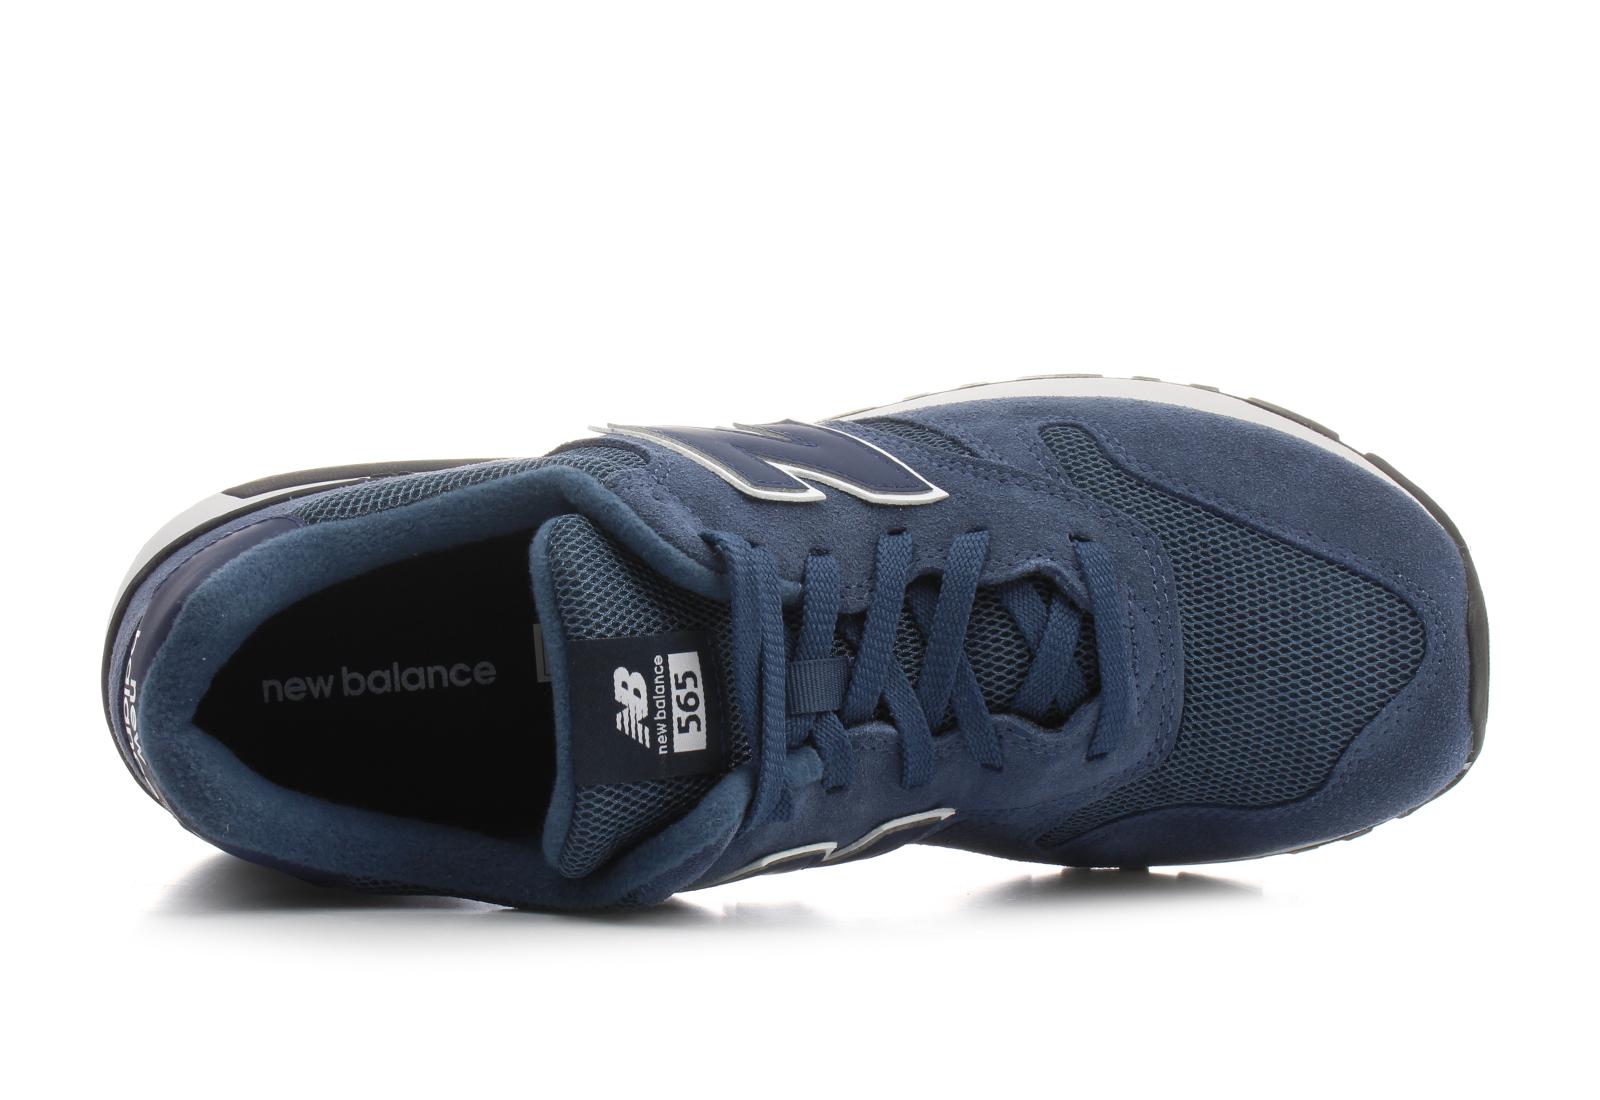 0048662d147 New Balance Niske Cipele Plave Cipele - Ml565 - Office Shoes - Online  trgovina obuće